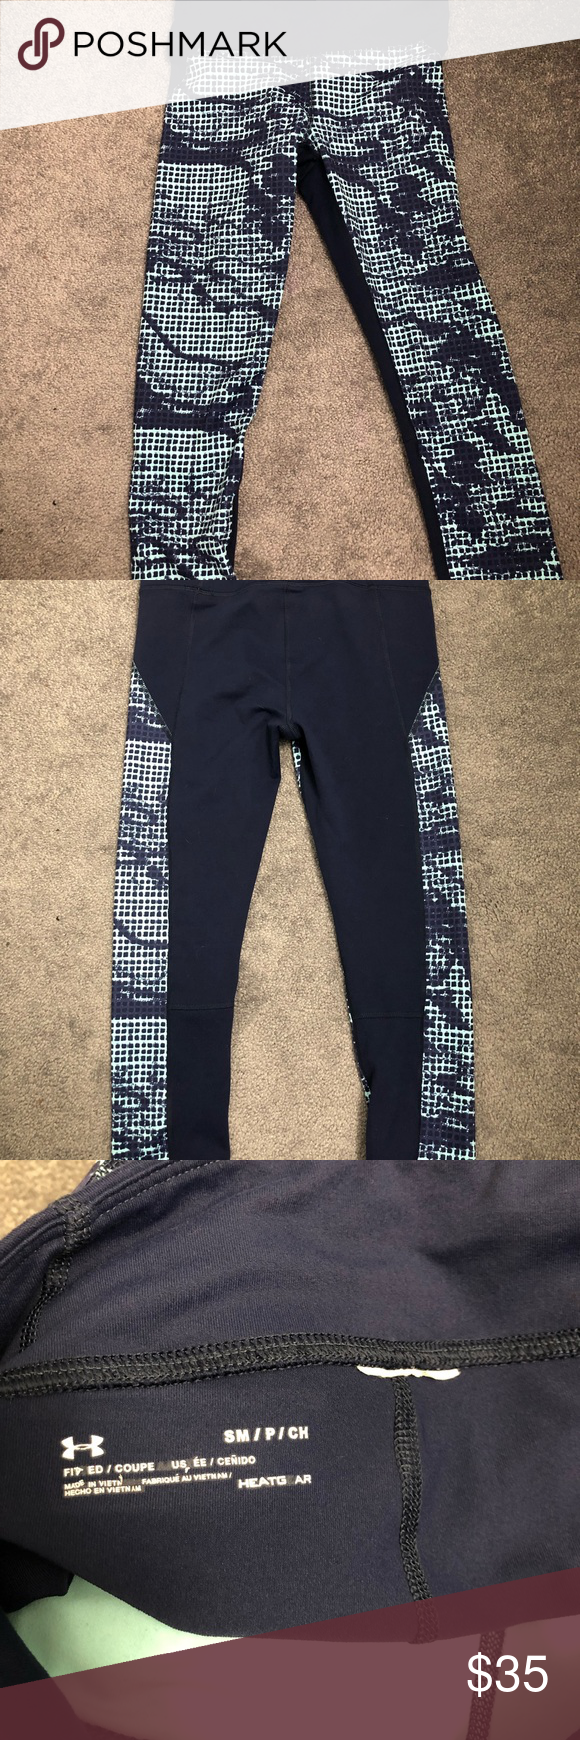 9b716a61ec00c Cropped leggings Under armor cropped blue patterned leggings! Super cute,  squat proof. Little hidden pocket. Worn twice. Under Armour Pants Leggings